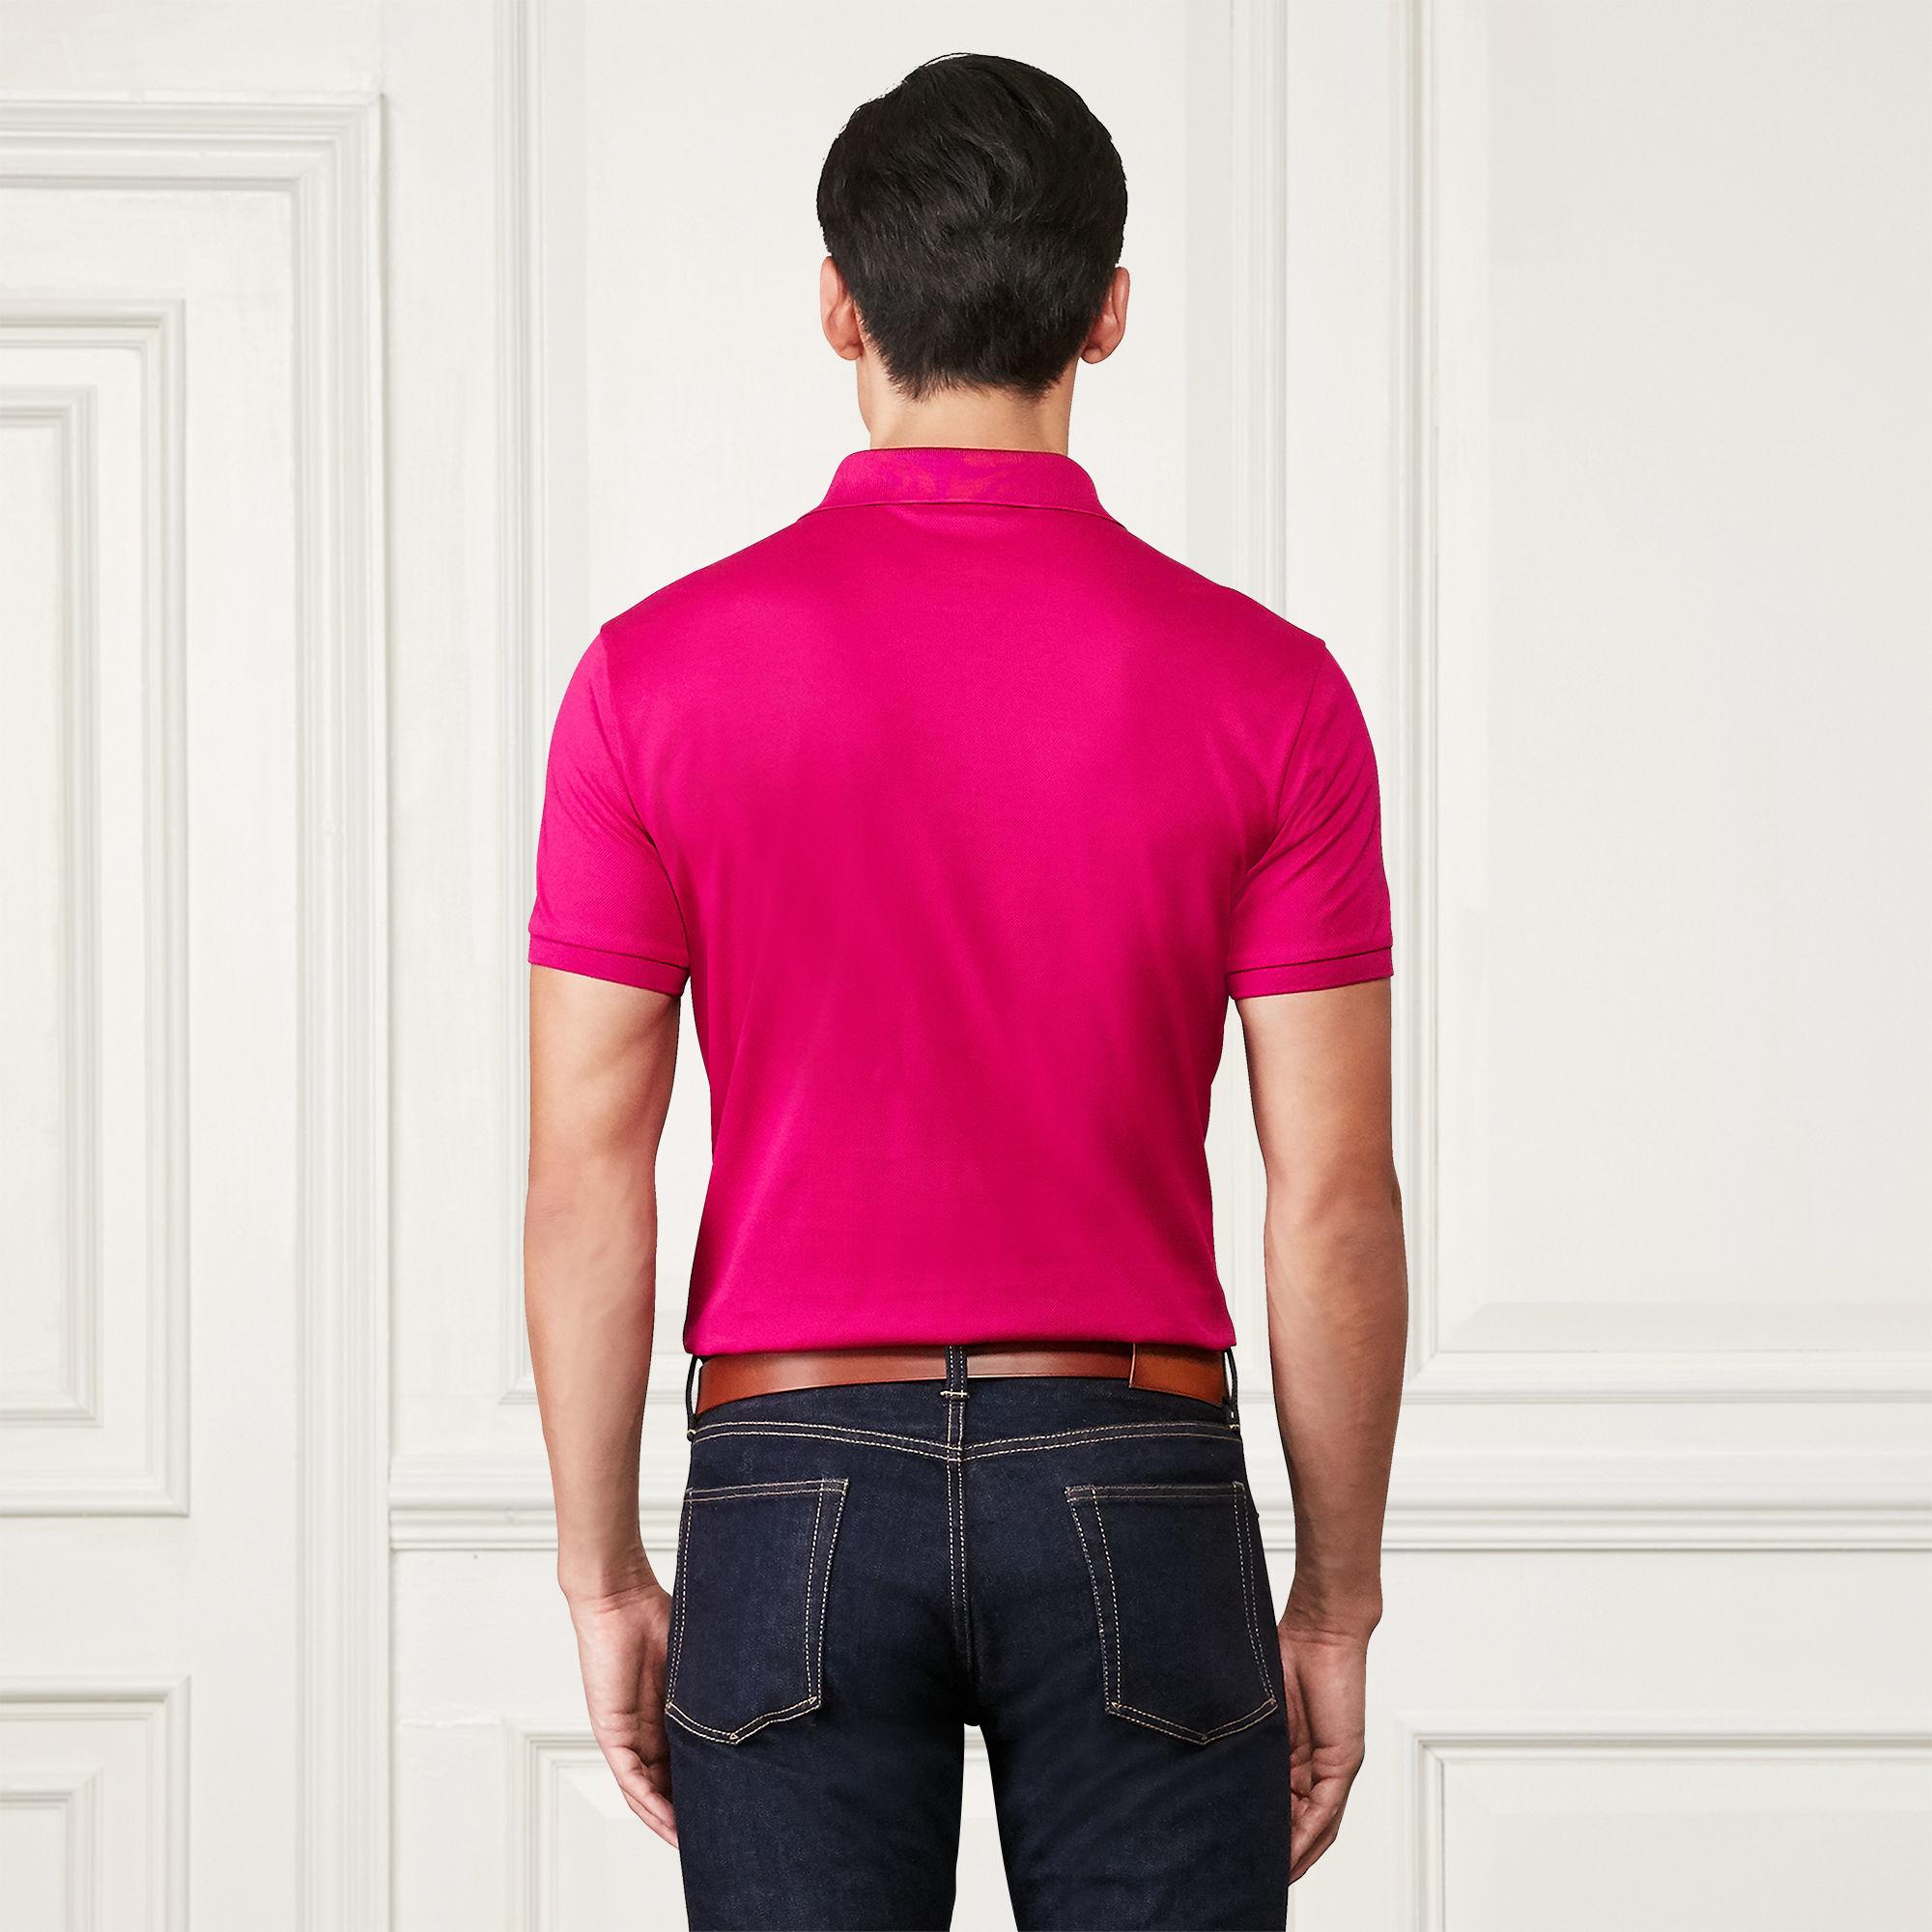 Ralph lauren purple label custom fit piqu polo shirt in for Ralph lauren black label polo shirt